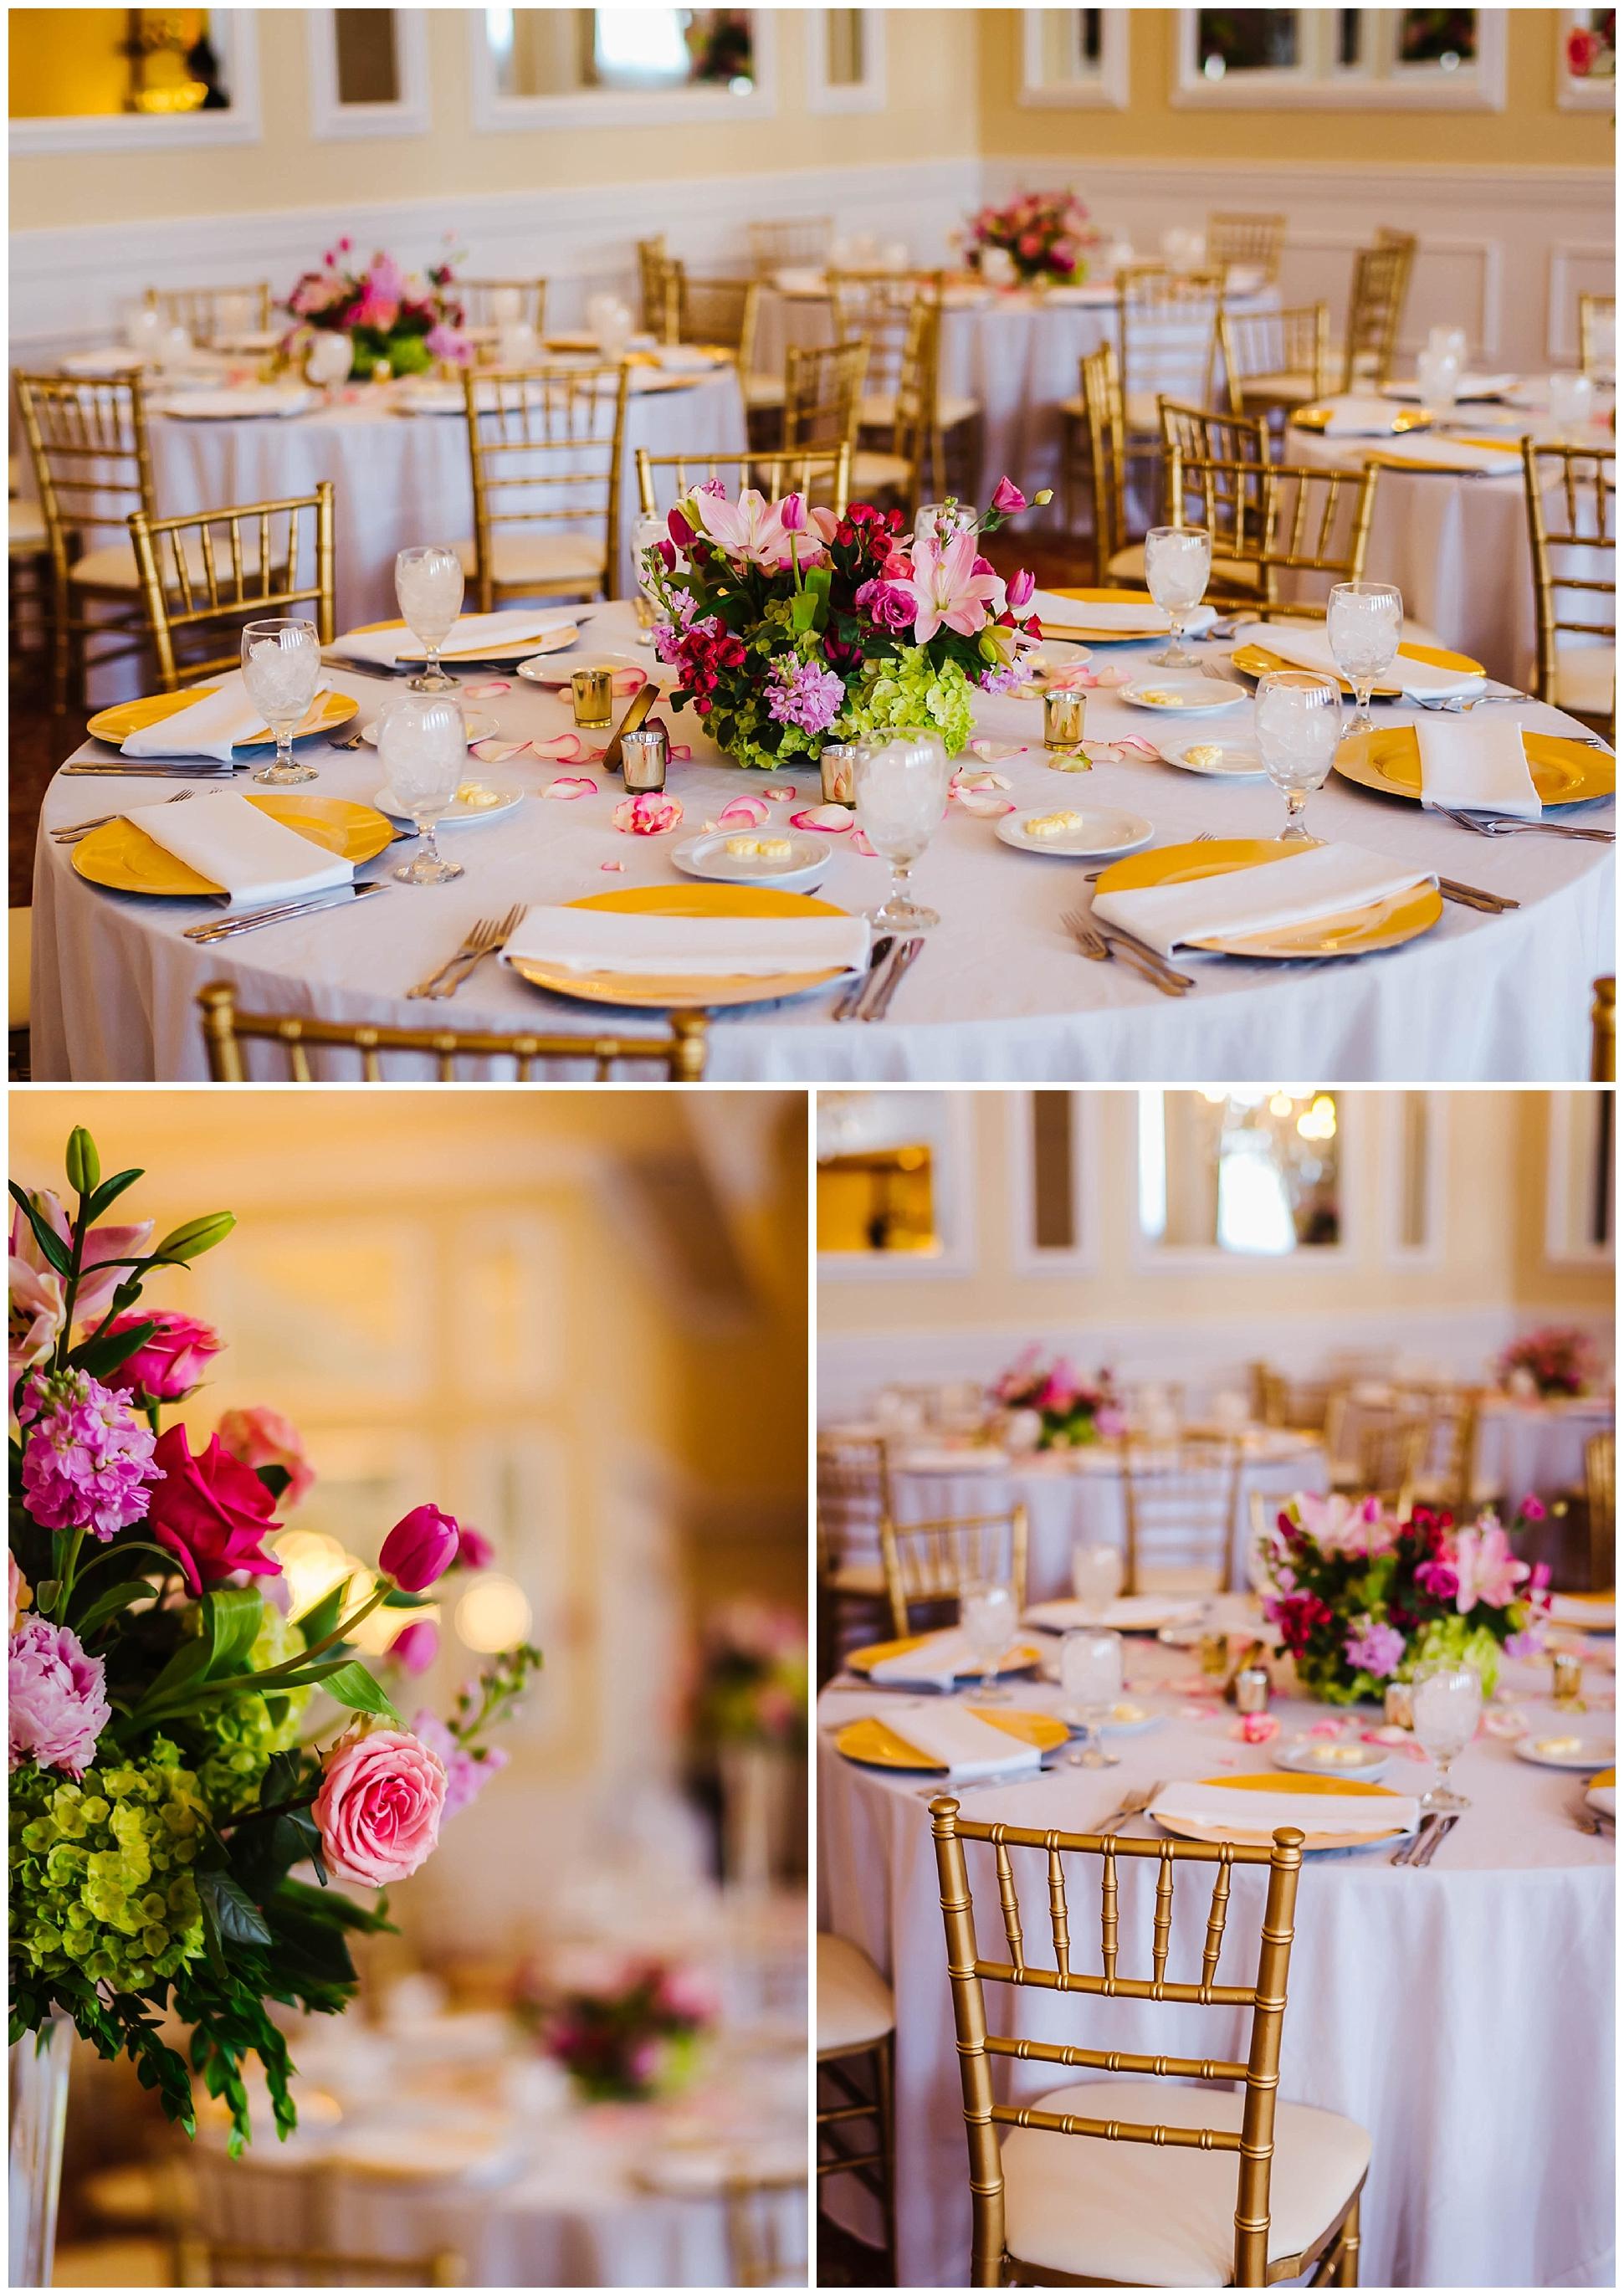 tampa-wedding-photographer-sleeves-palma-ceia-country-club-golf-course-sunset-luxury_0063.jpg